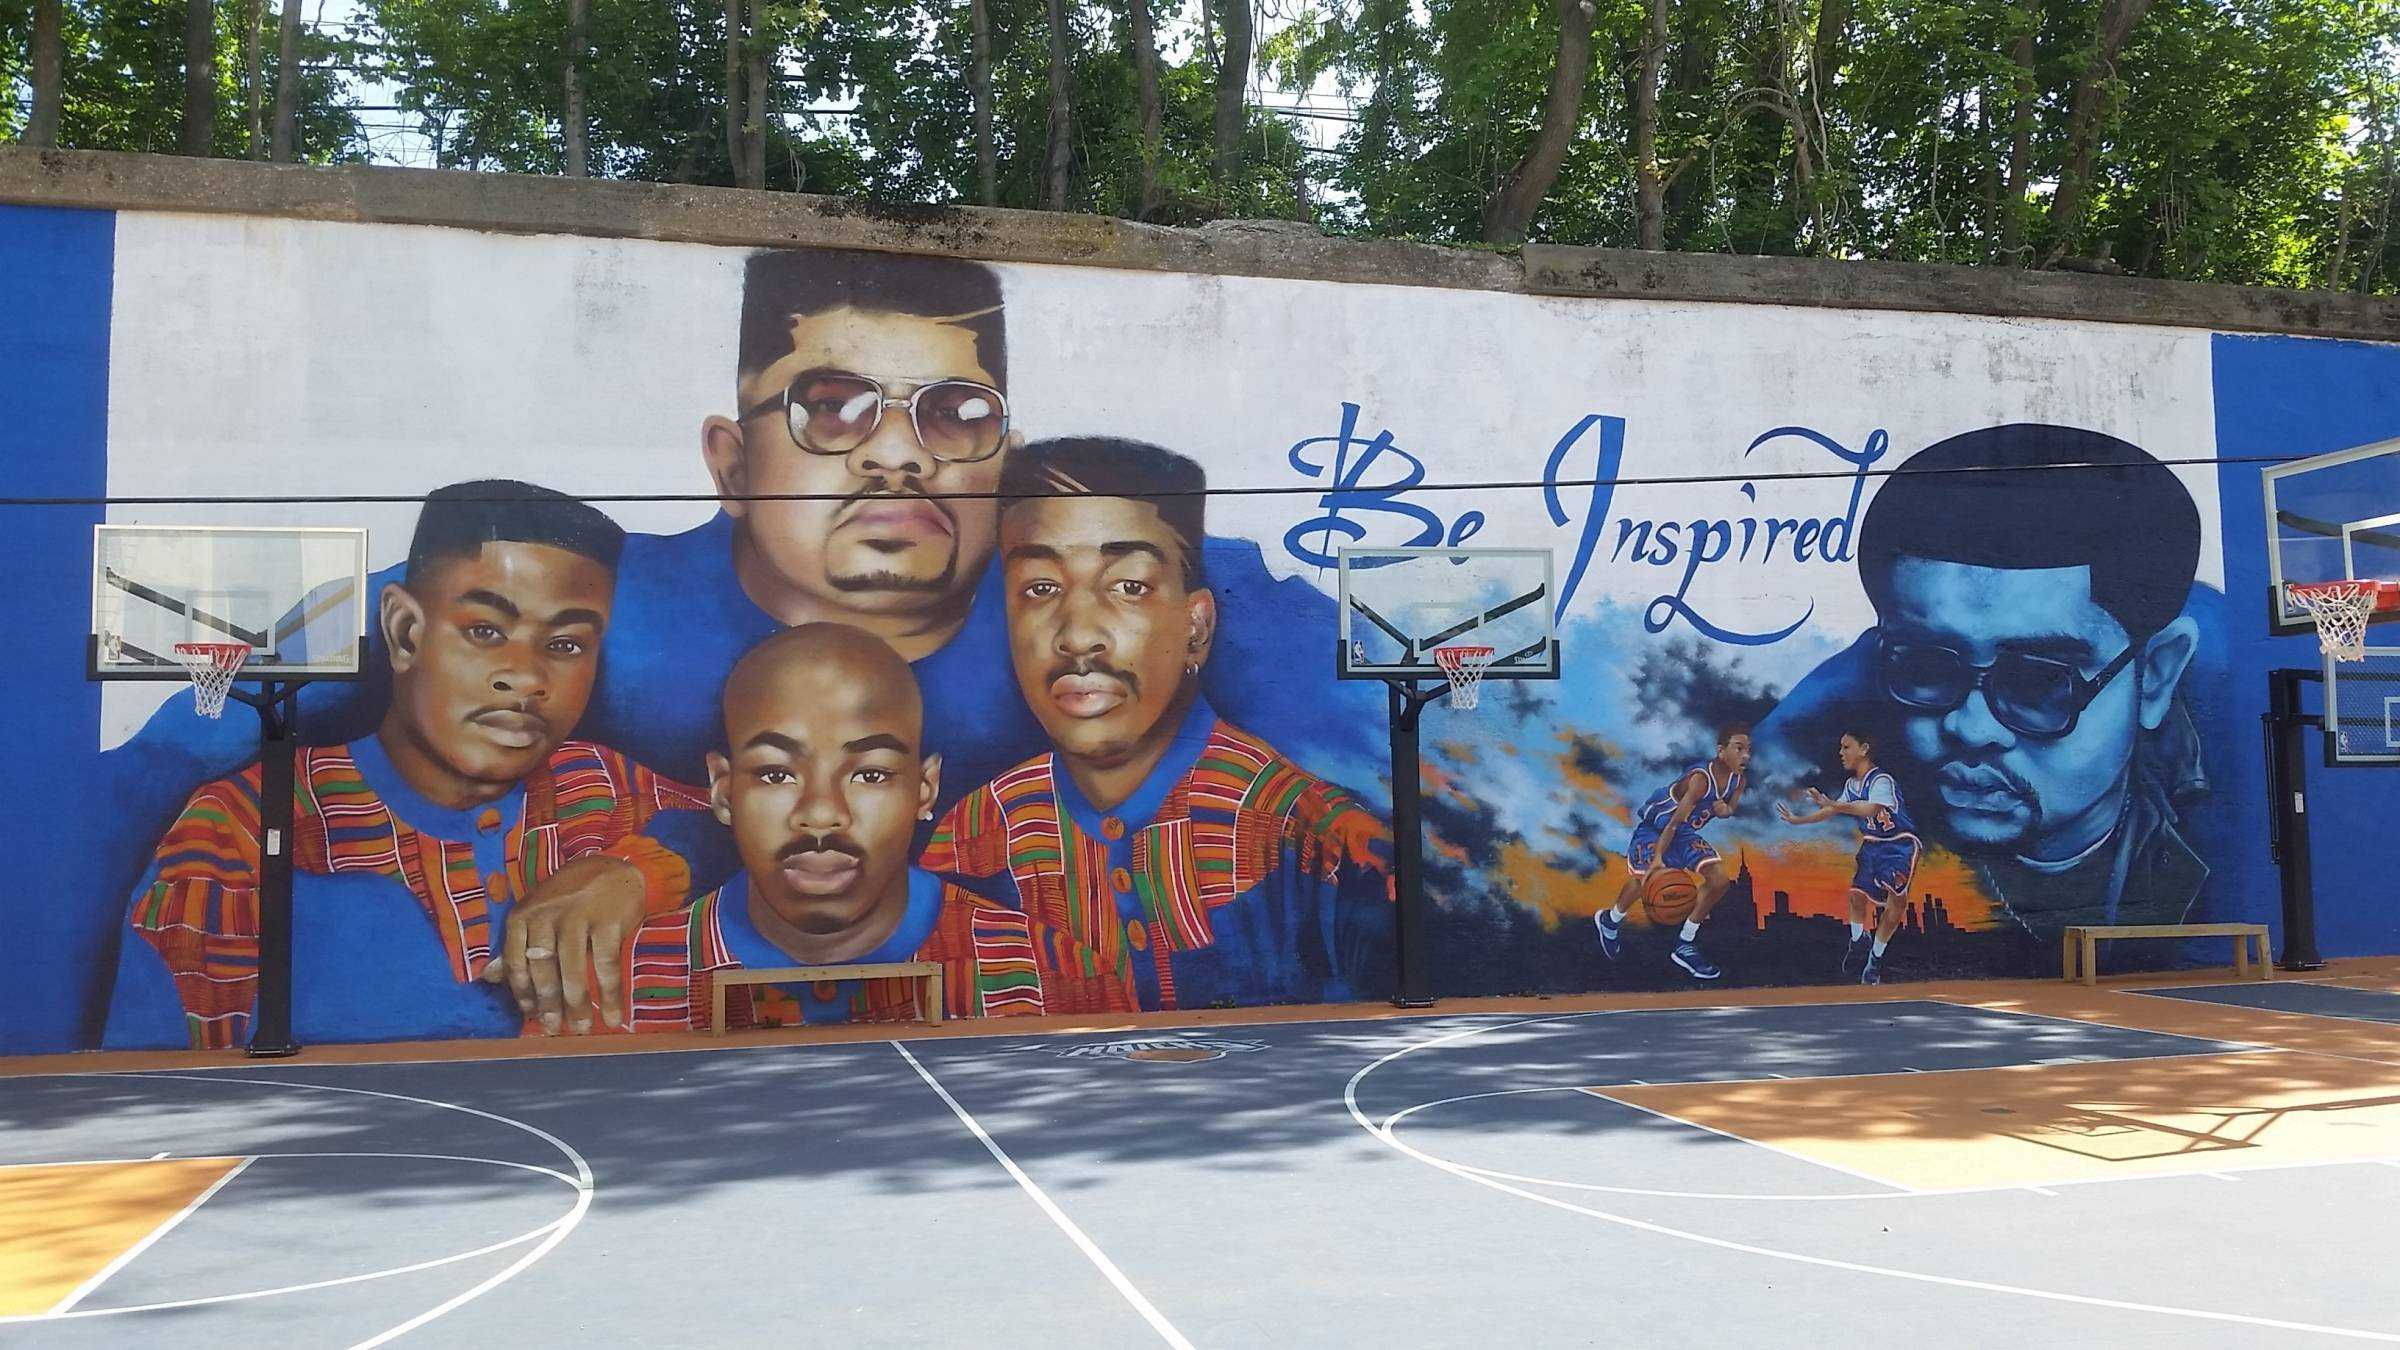 New York Street-Art Artist Andre Trenier To Unveil Pop Up Art Show At Bronx Terminal Market